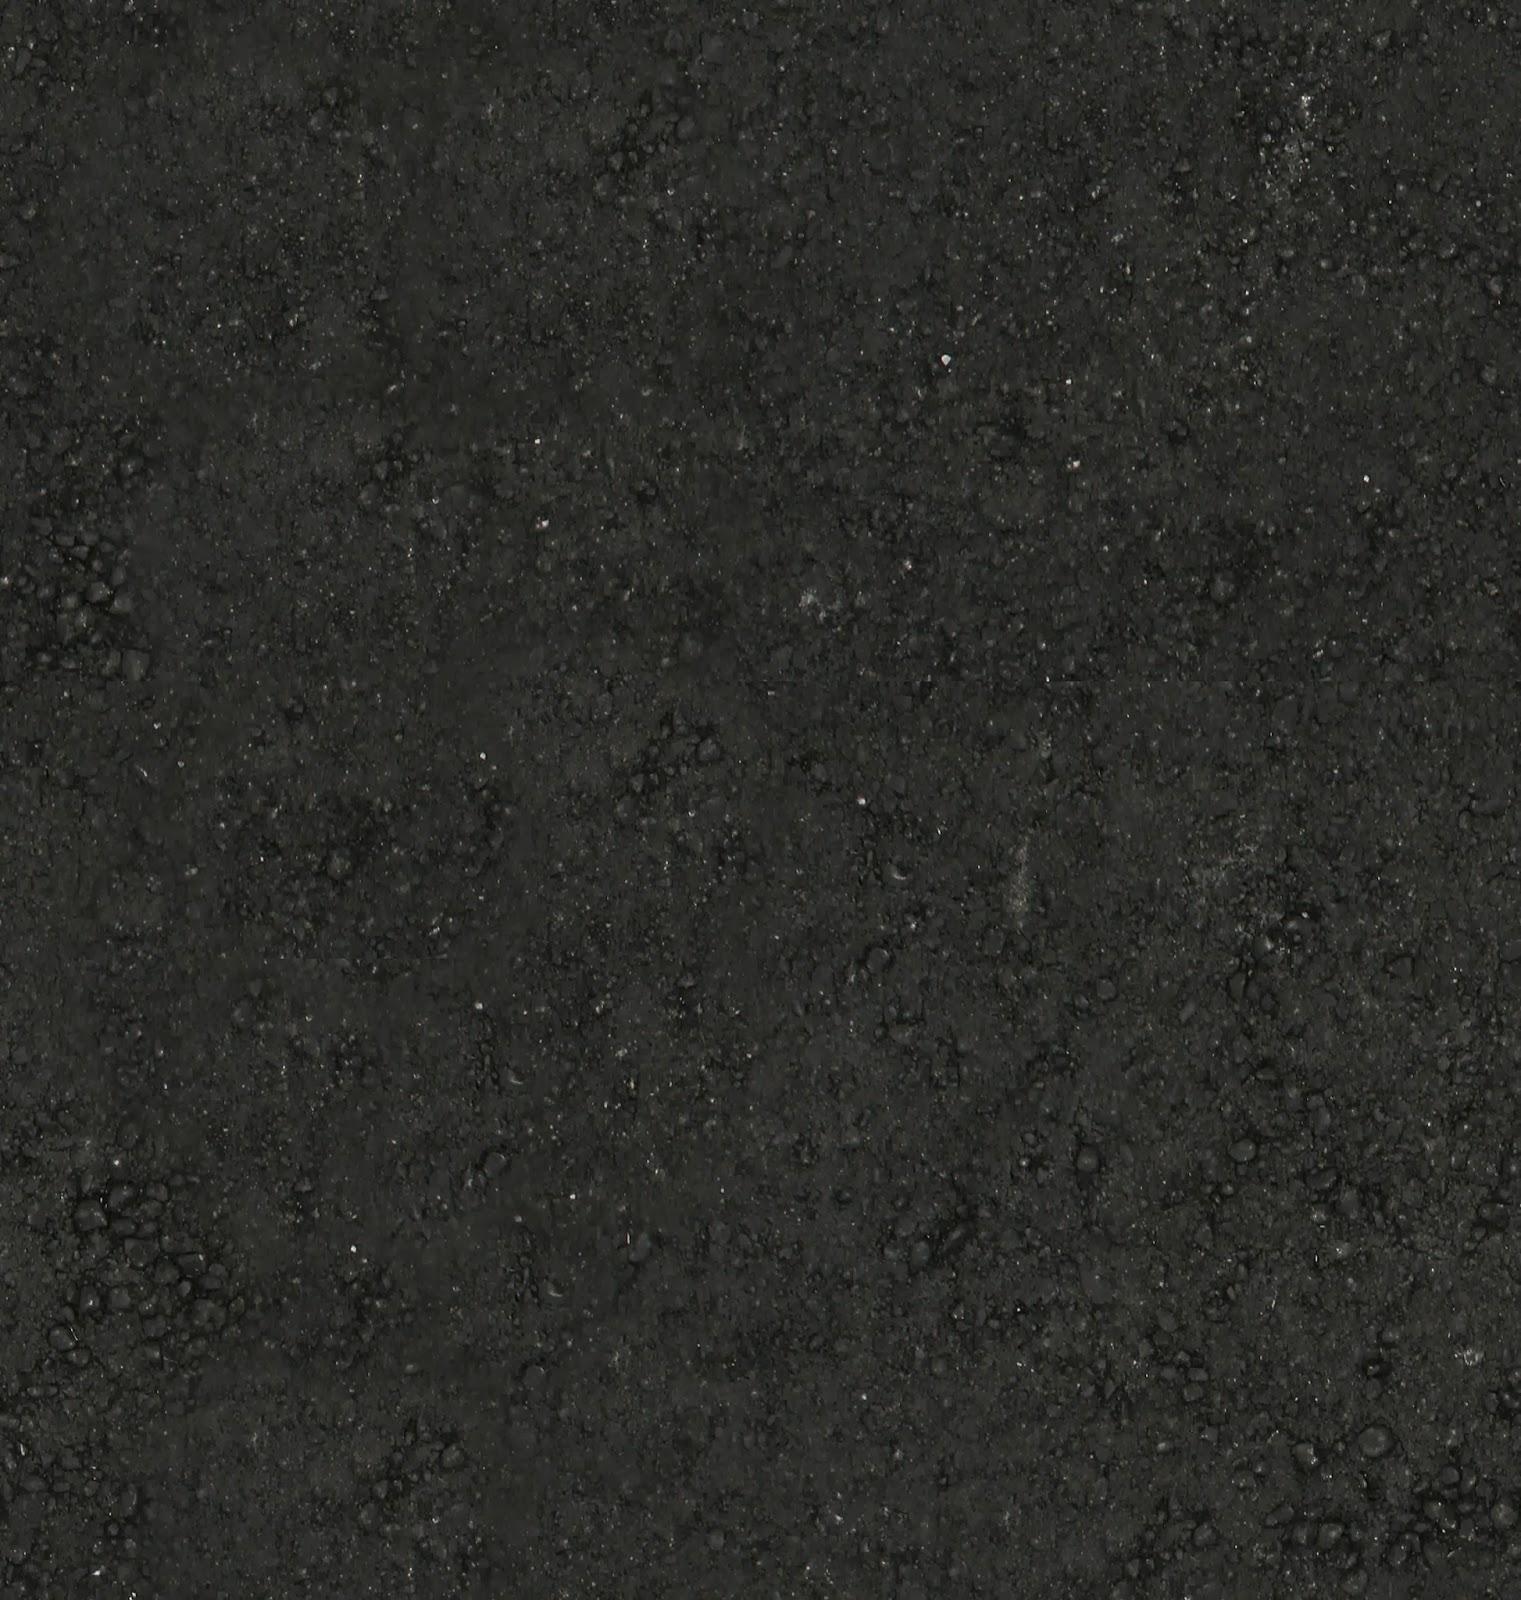 Seamless Asphalt Texture + (Maps)   Texturise Free ...